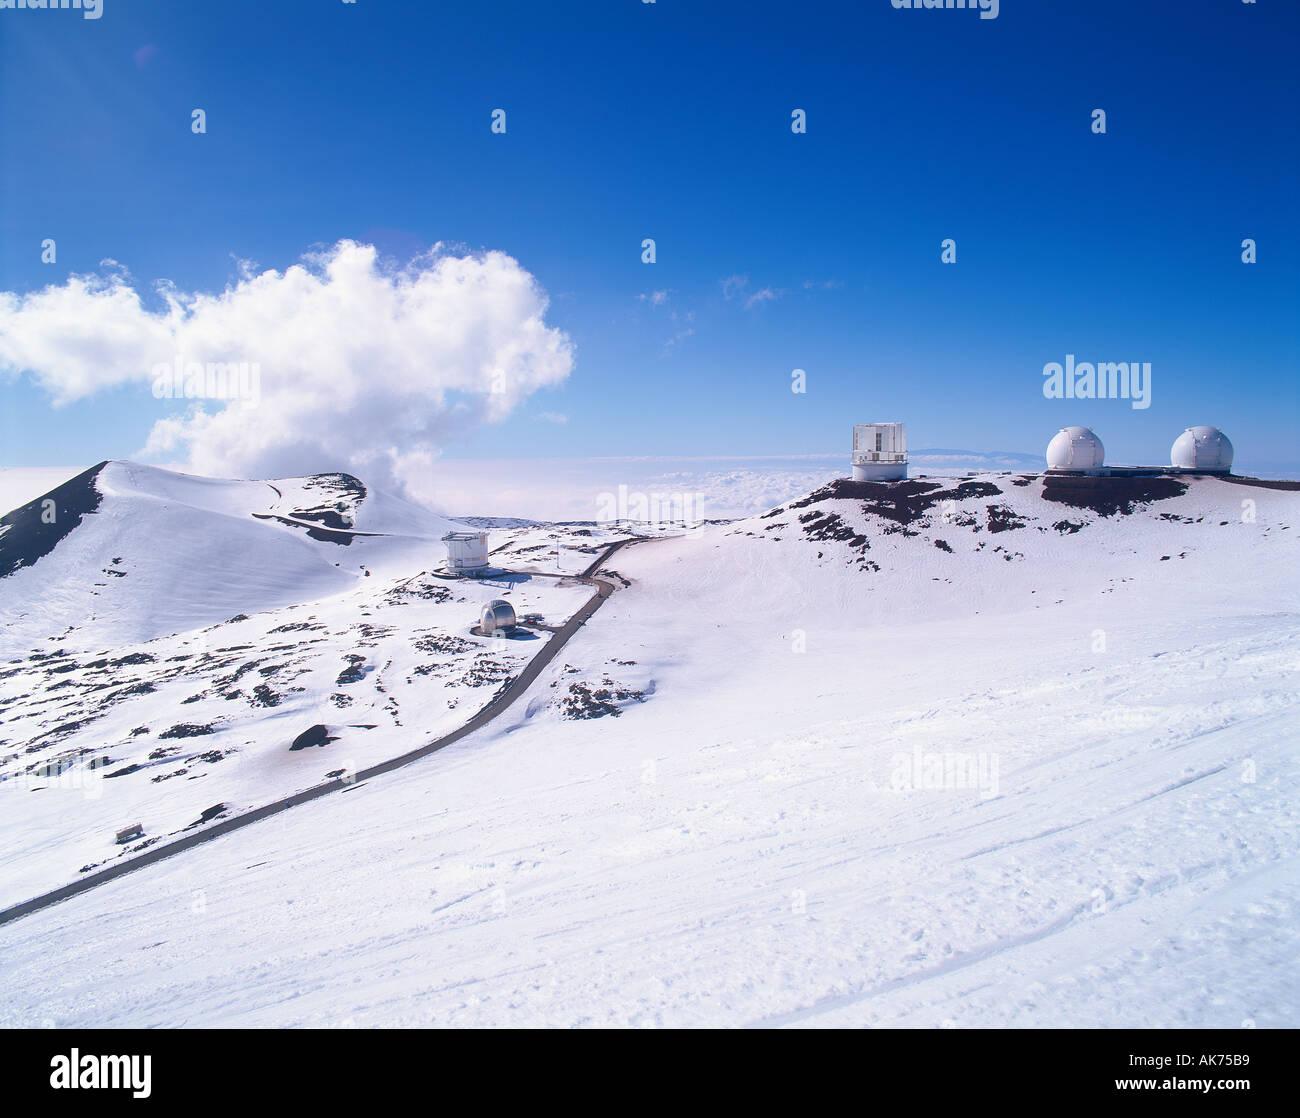 mauna kea hawaii snow stock photos & mauna kea hawaii snow stock